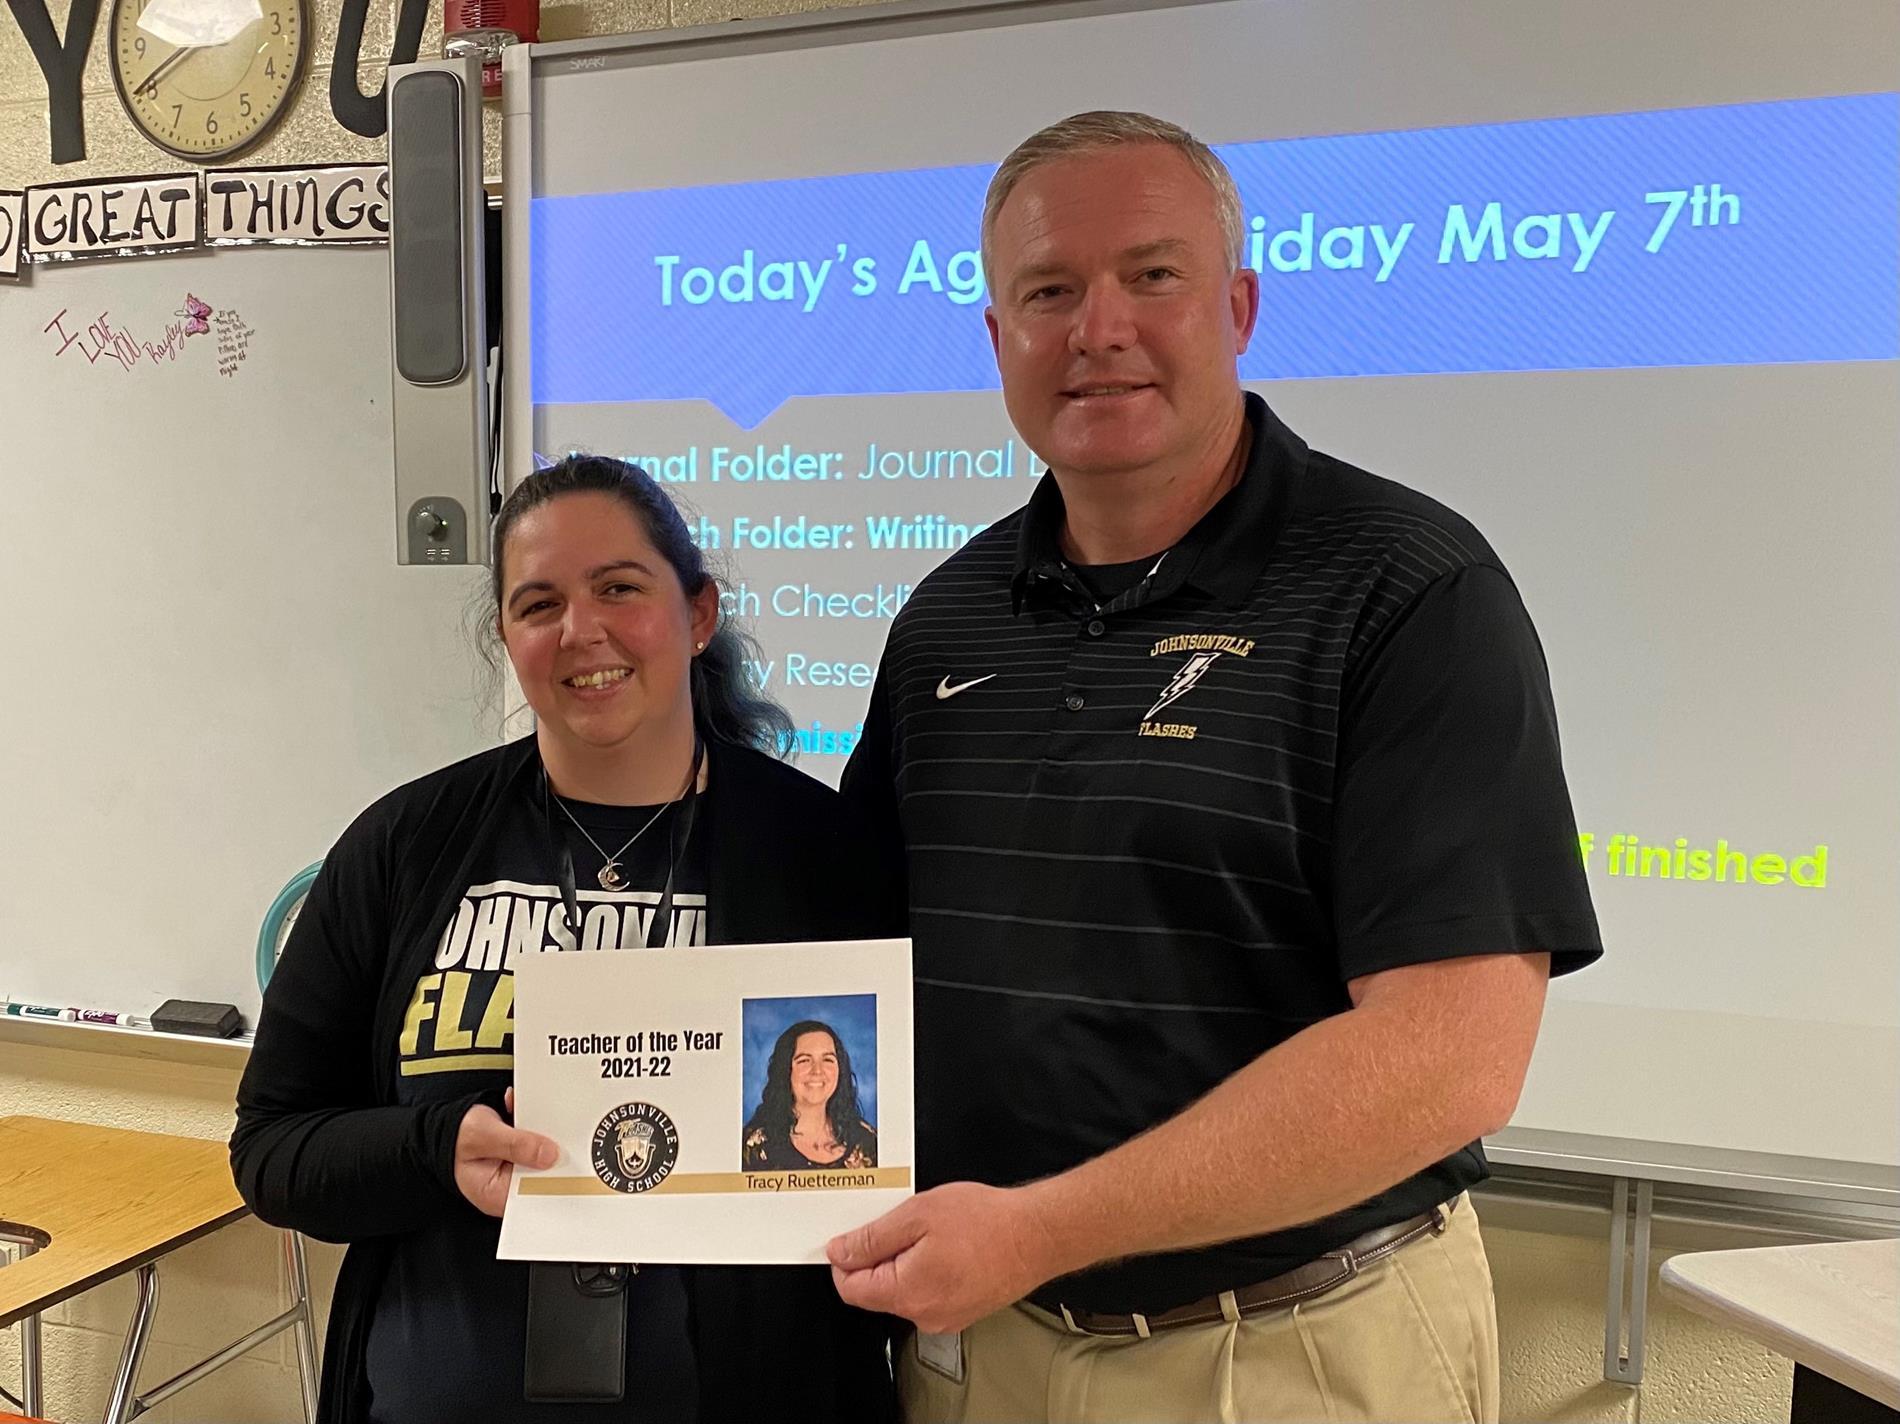 Ruetterman Teacher of the Year